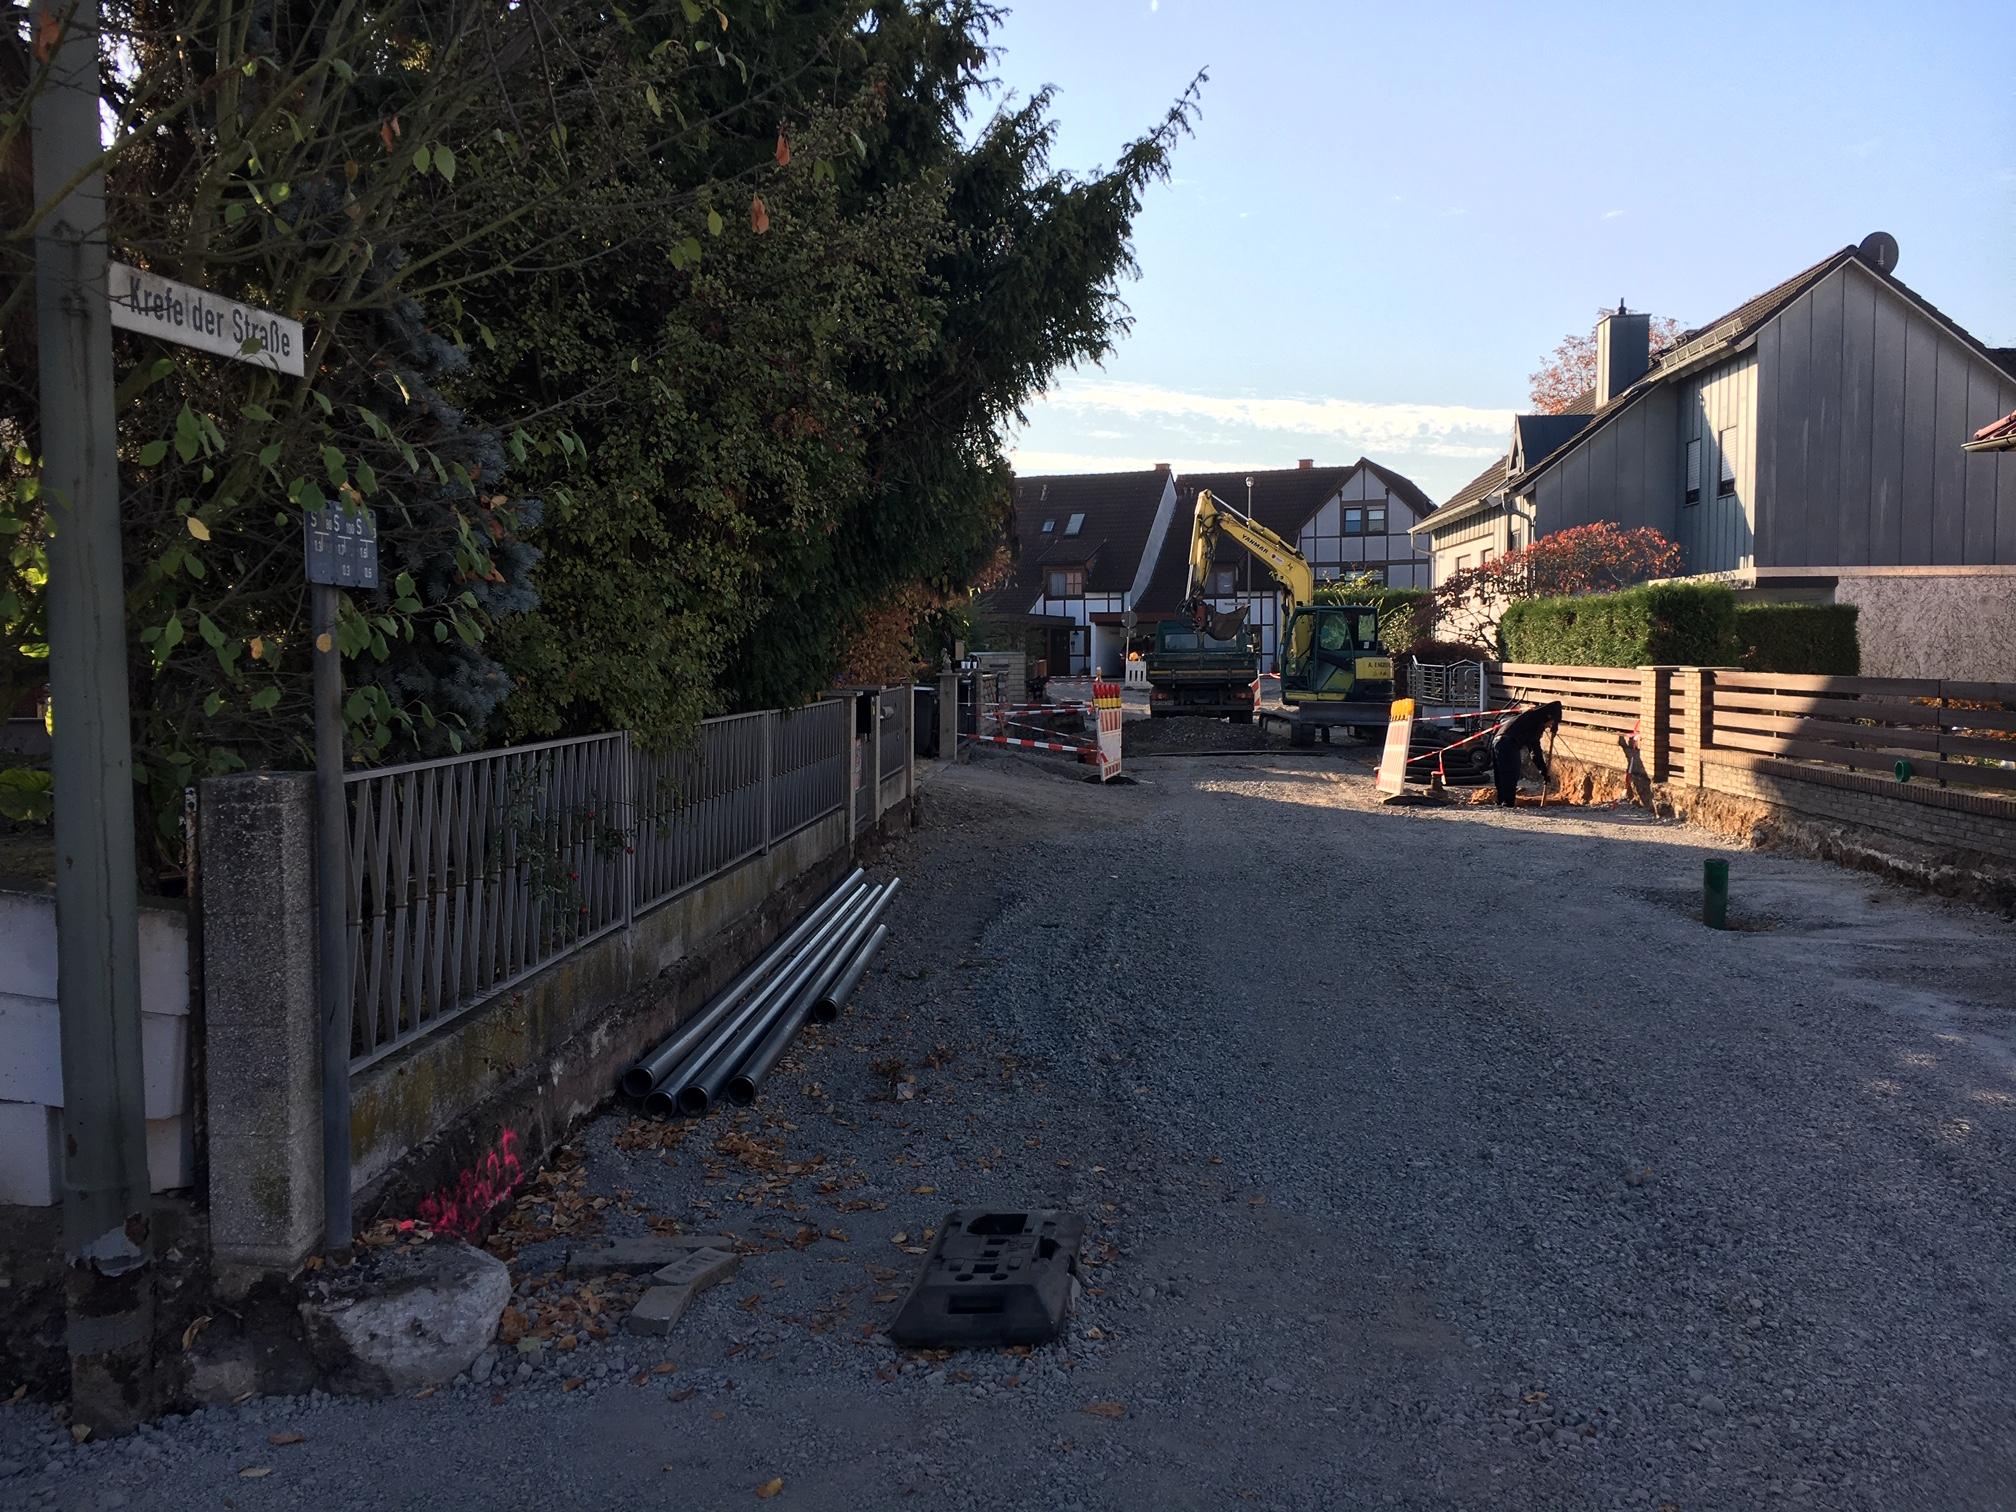 Krefelder Straße